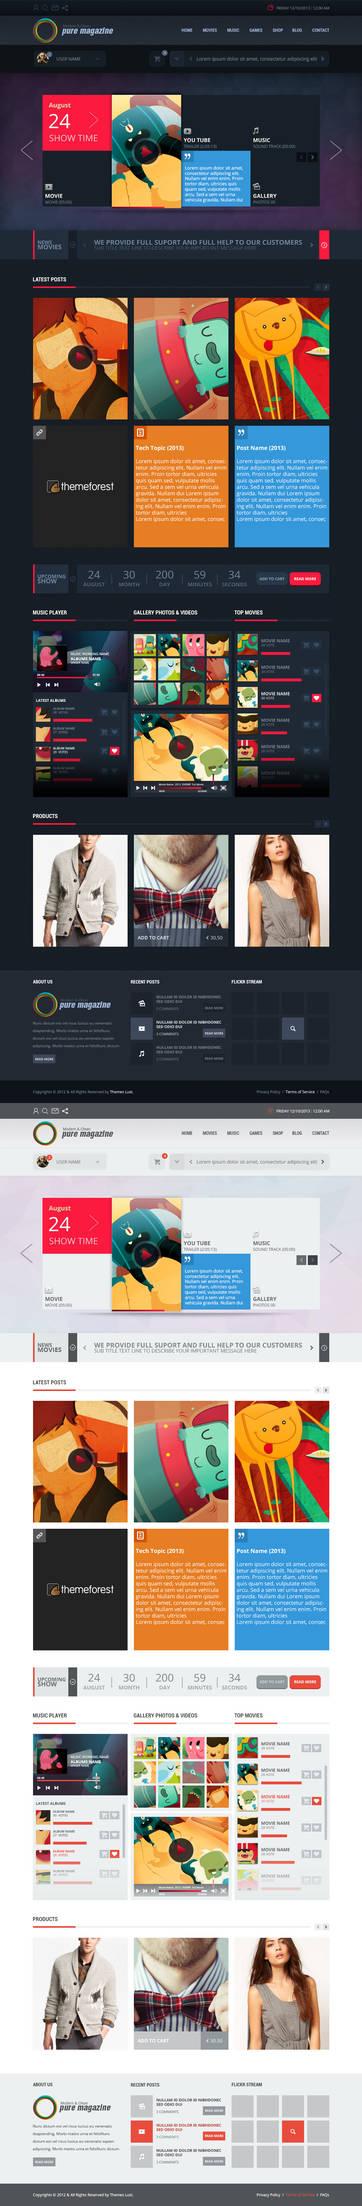 Pure Magazine: News/Blog/Shop HTML5/CSS3 Theme